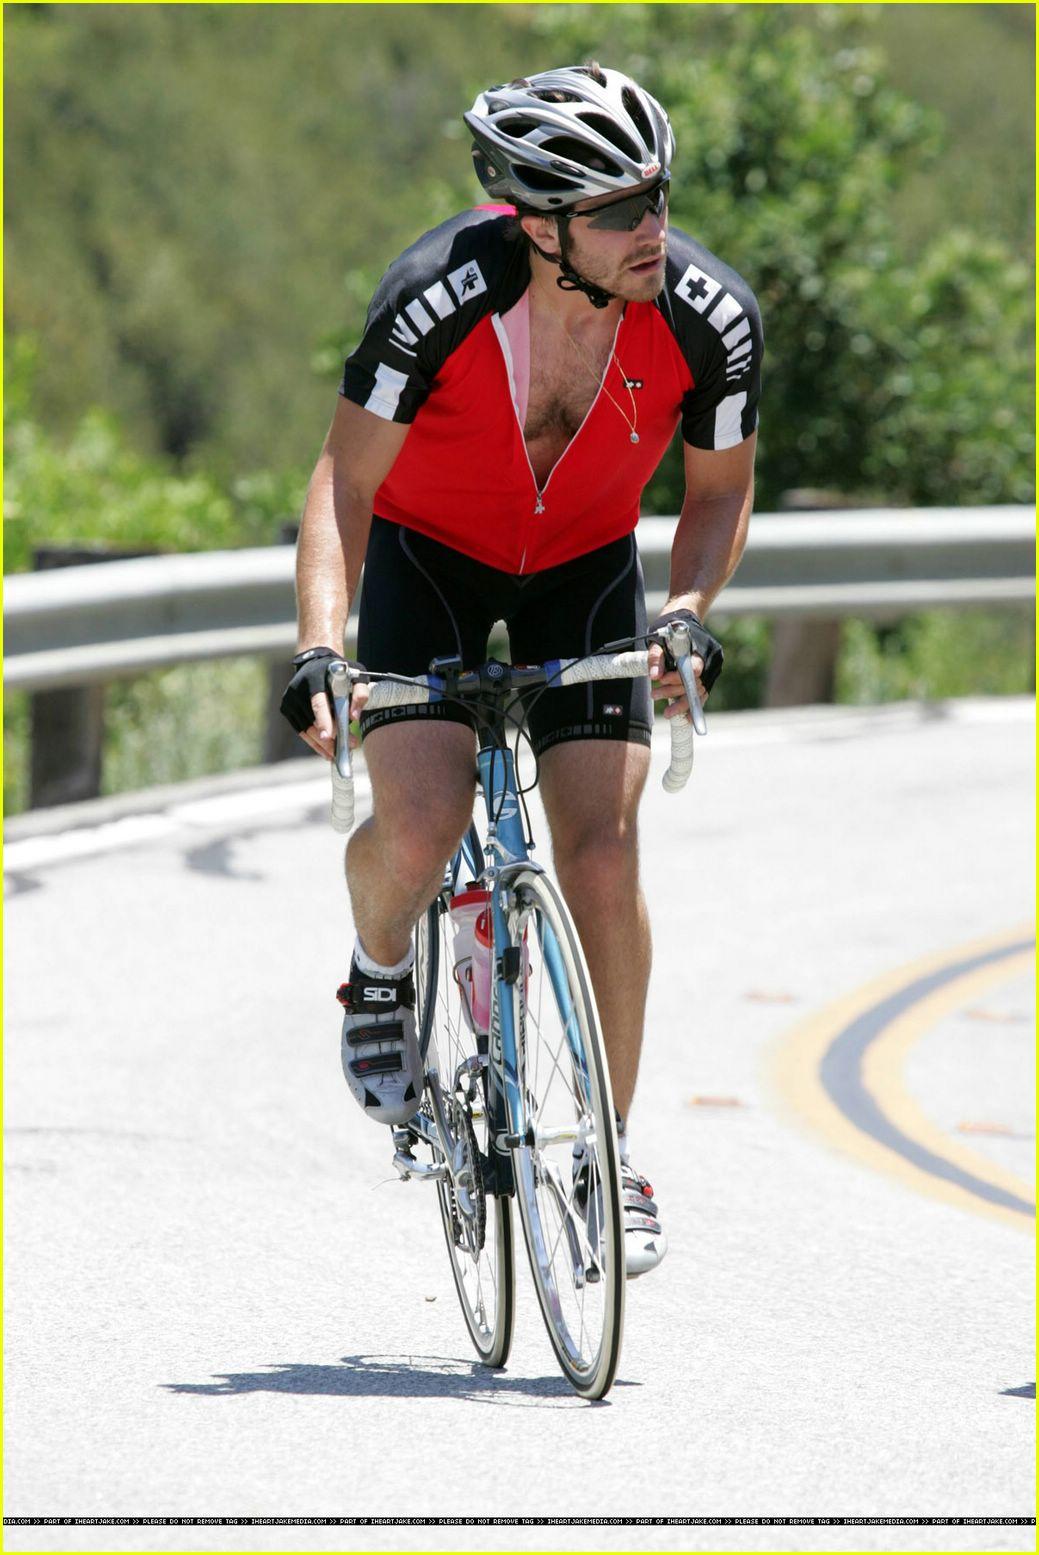 Full Sized Photo of jake gyllenhaal hairy chest27 | Photo ... Jake Gyllenhaal's